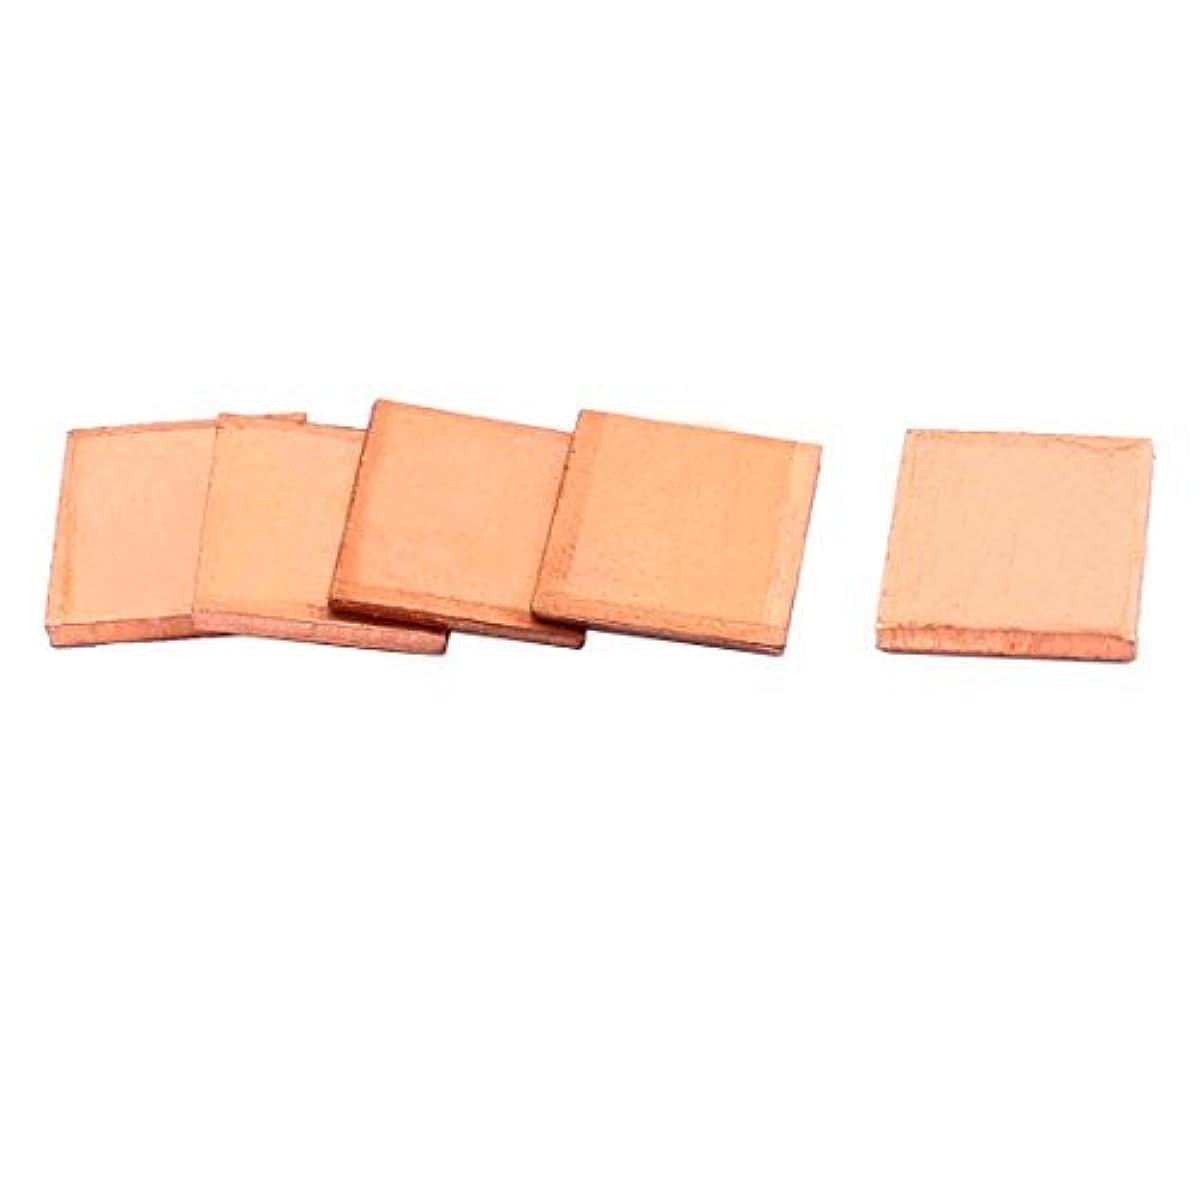 EbuyChX Copper PC Laptop CPU Pad Pad Heatsink Thermal Shim 15x15x2.0mm 5pcs